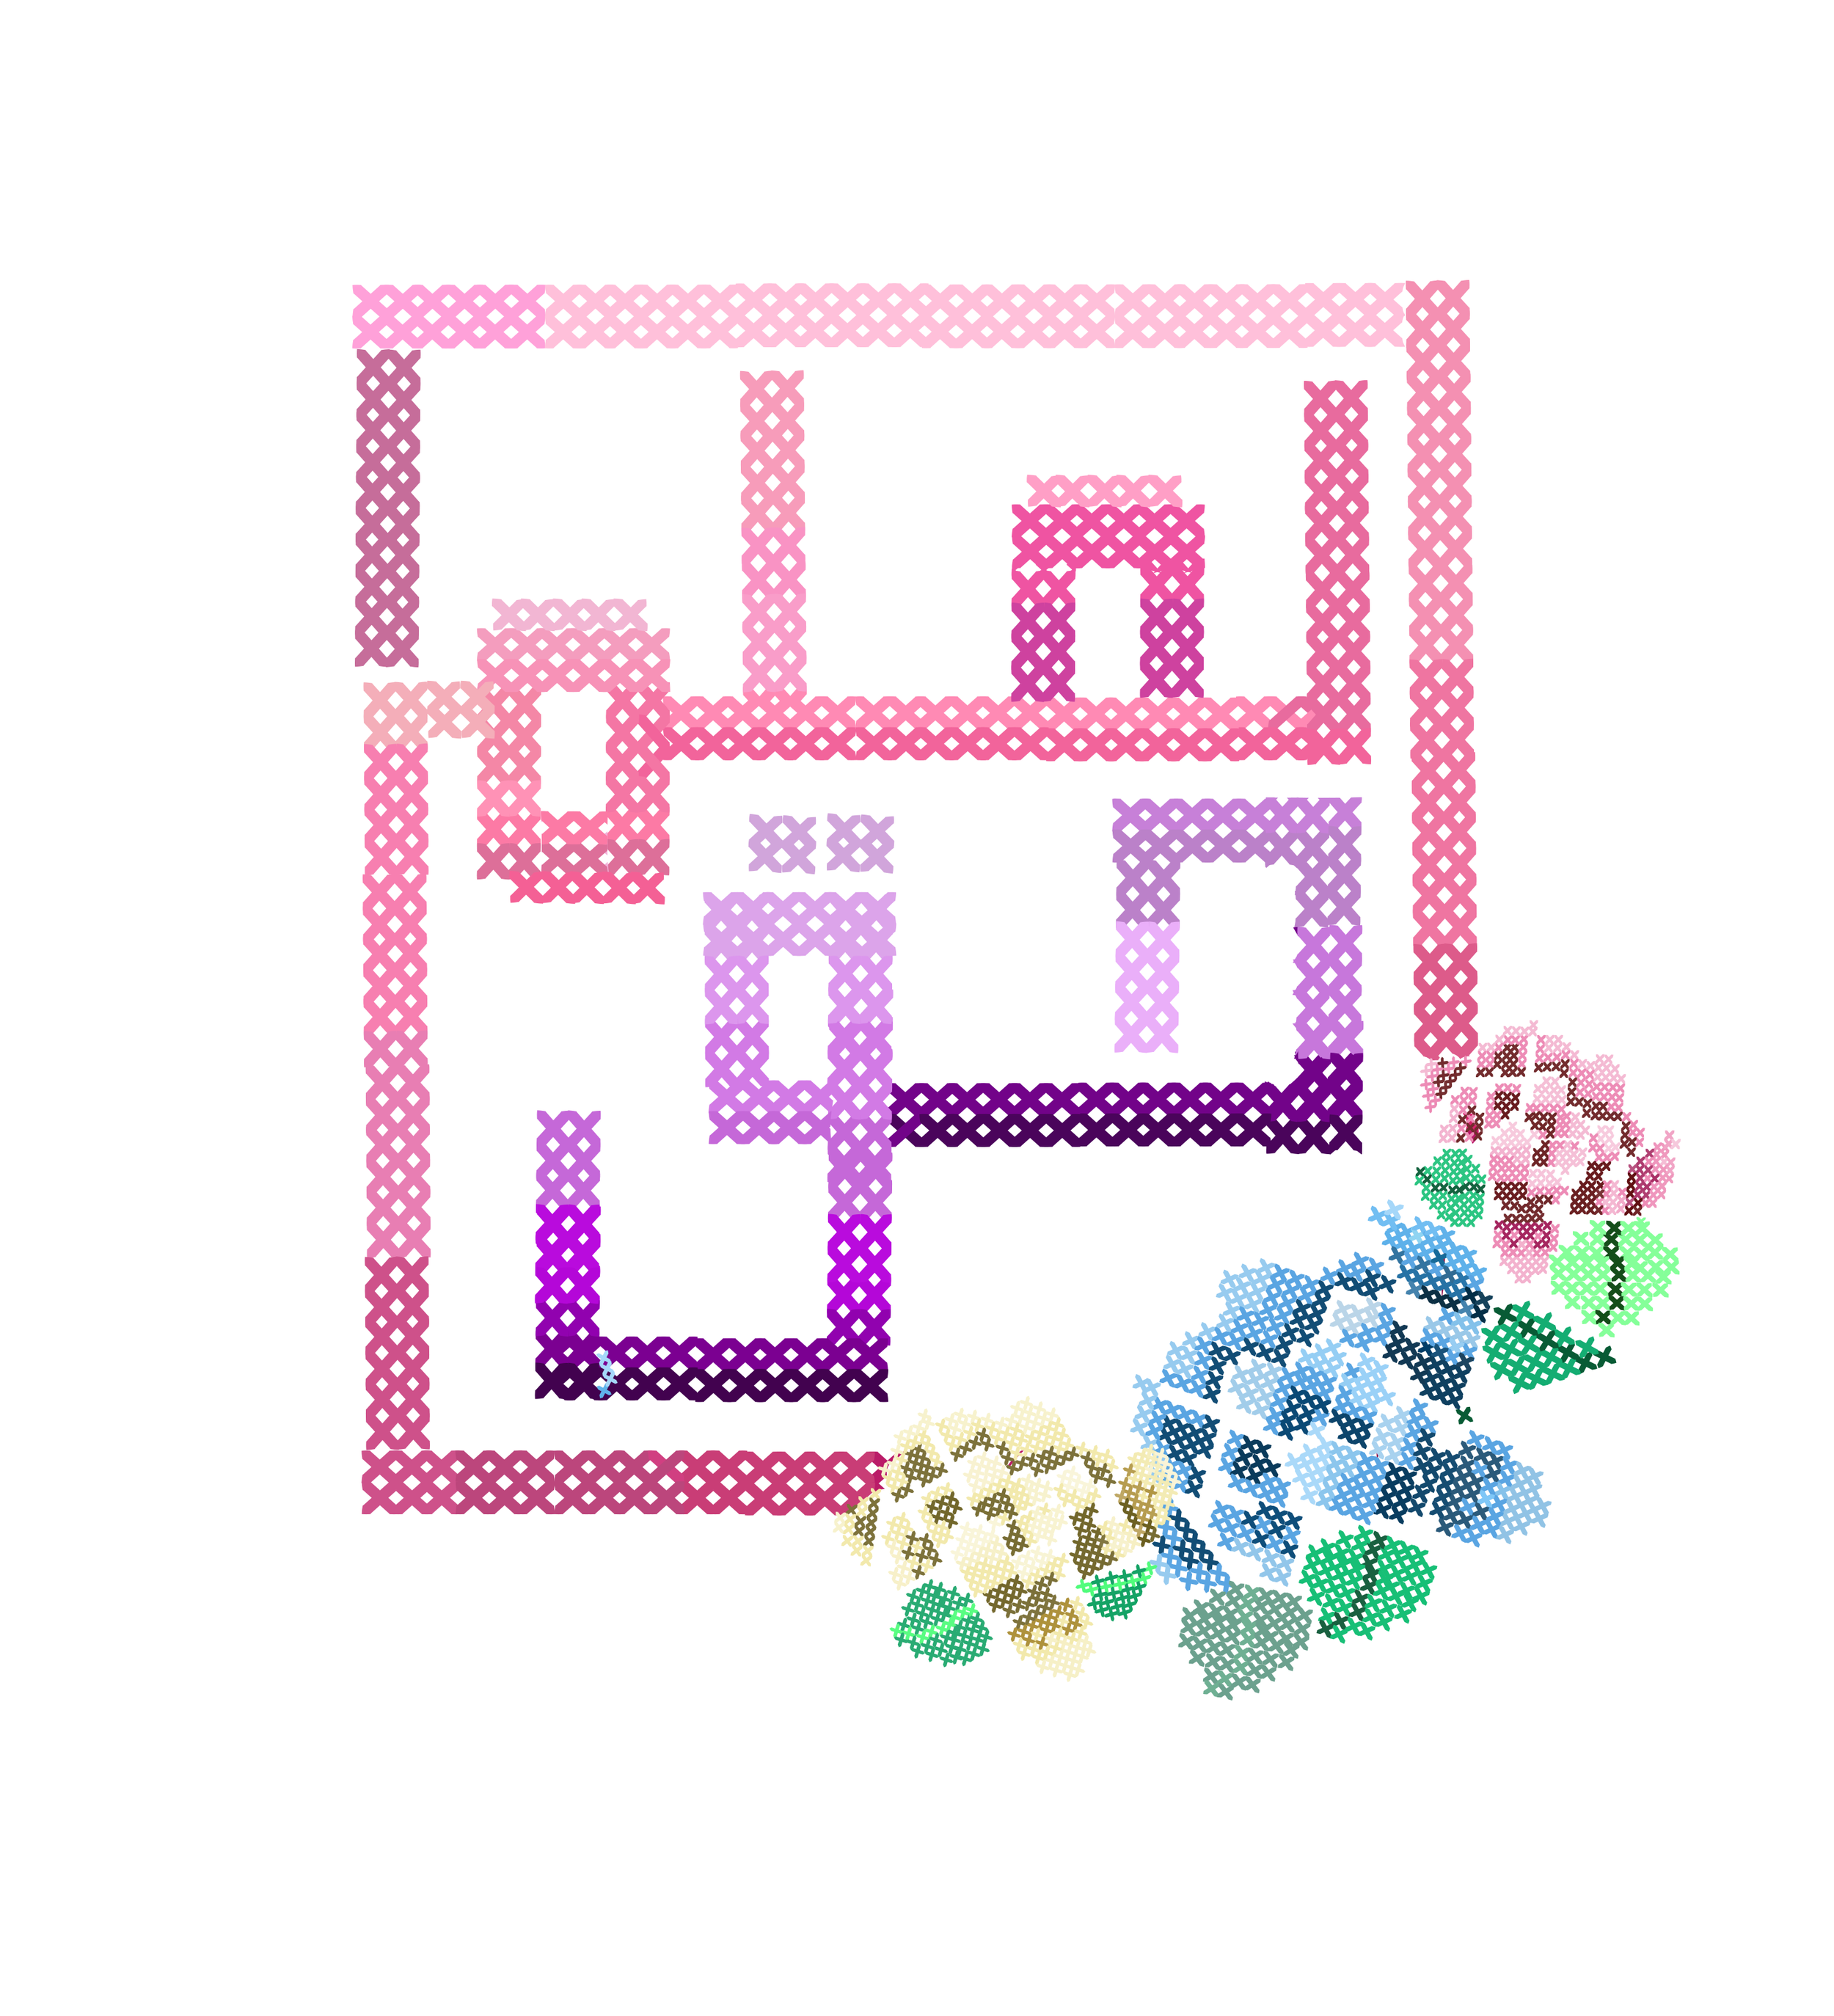 Our beautiful Tatreez inspired design